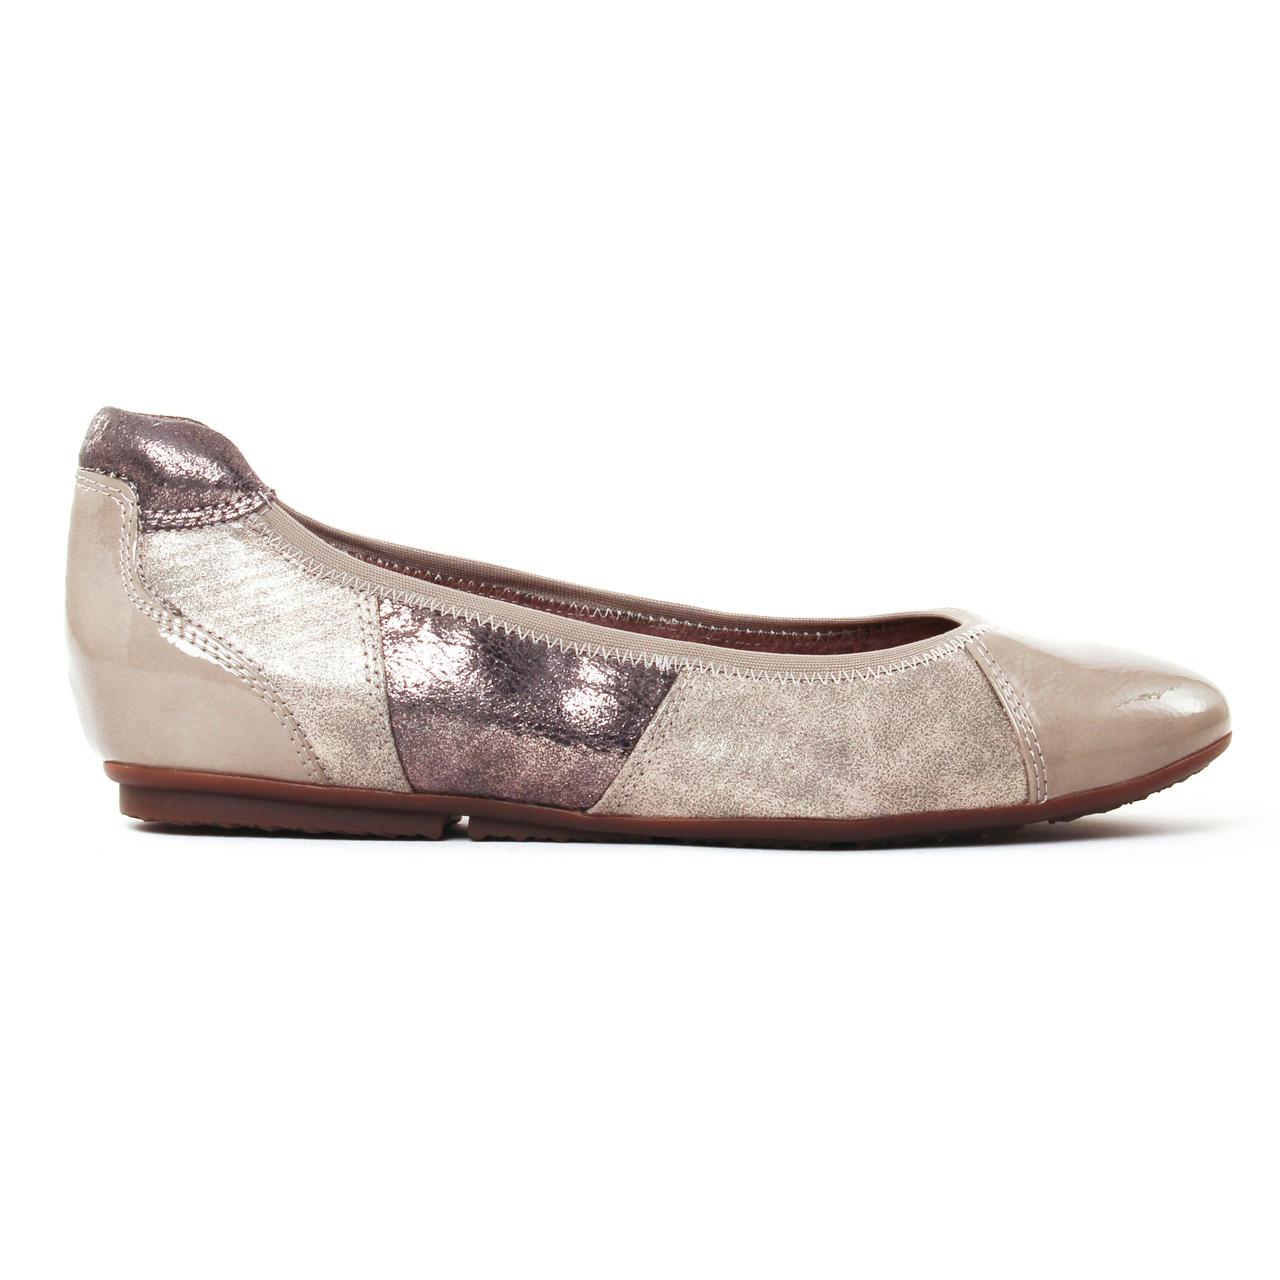 Tamaris Femmes Ballerine Textile Beige Chaussures Pour Femme